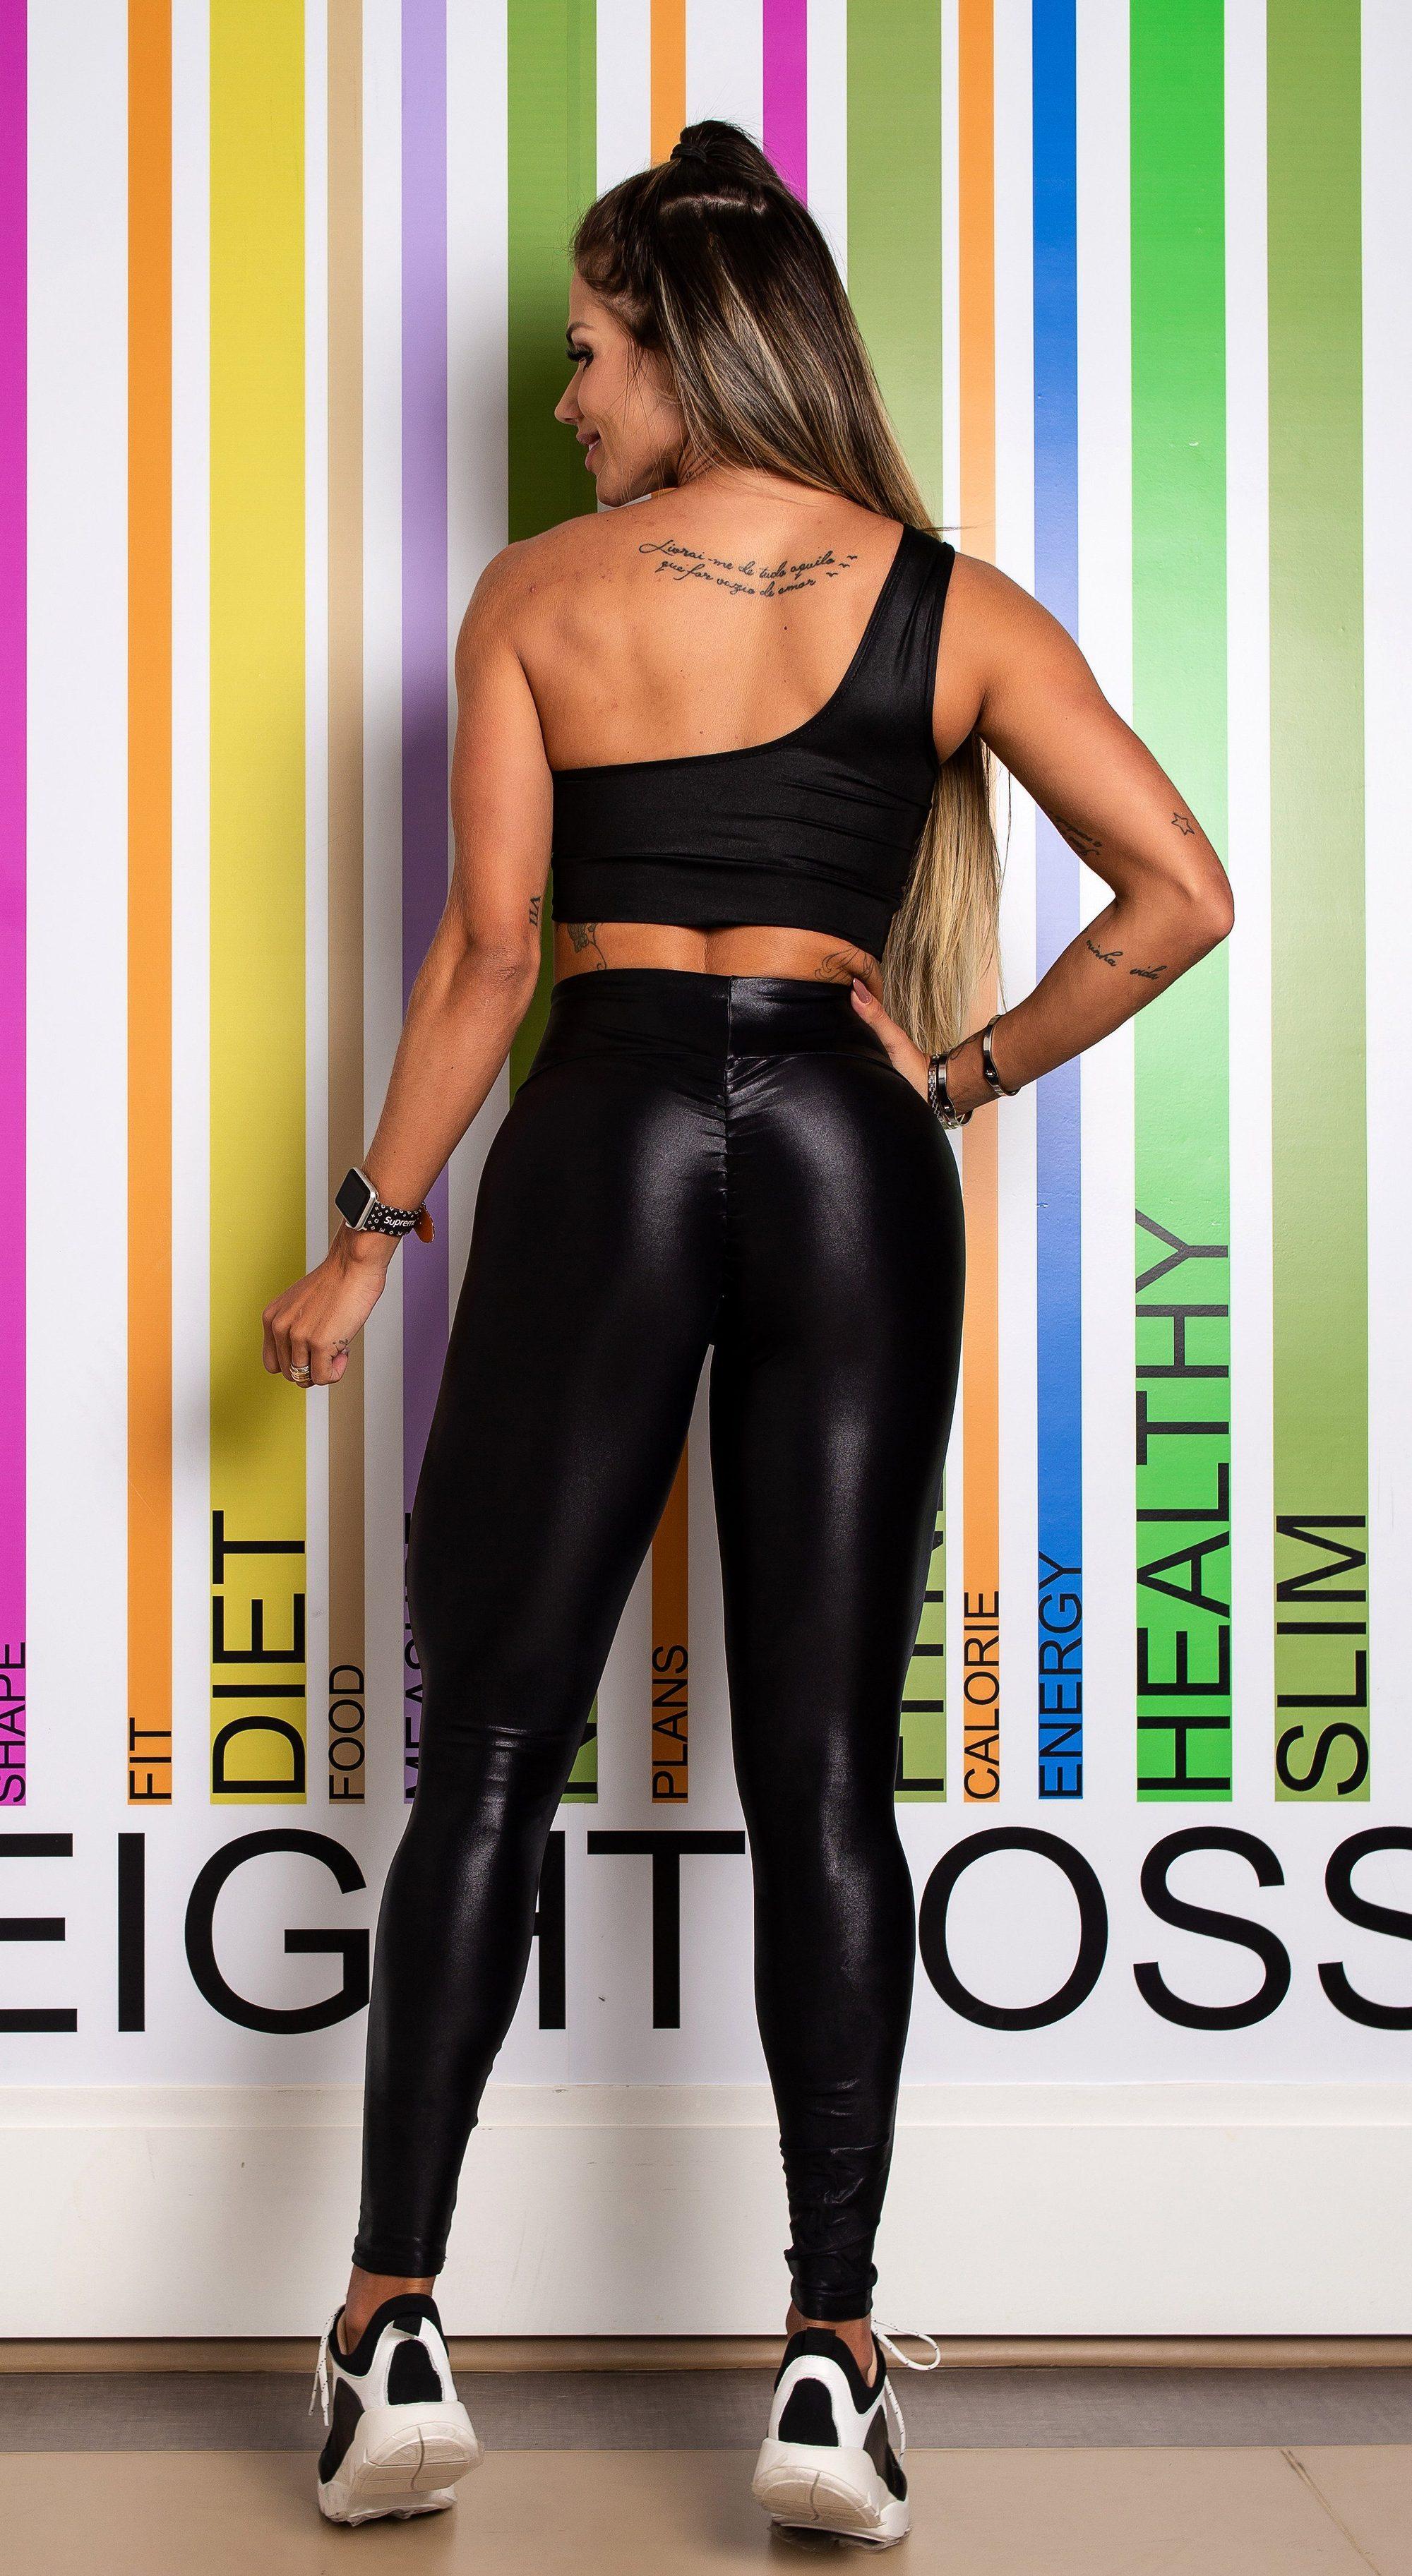 Wet-Look -Leggingsshop Our Fashion Fitness Forward Gym -9982